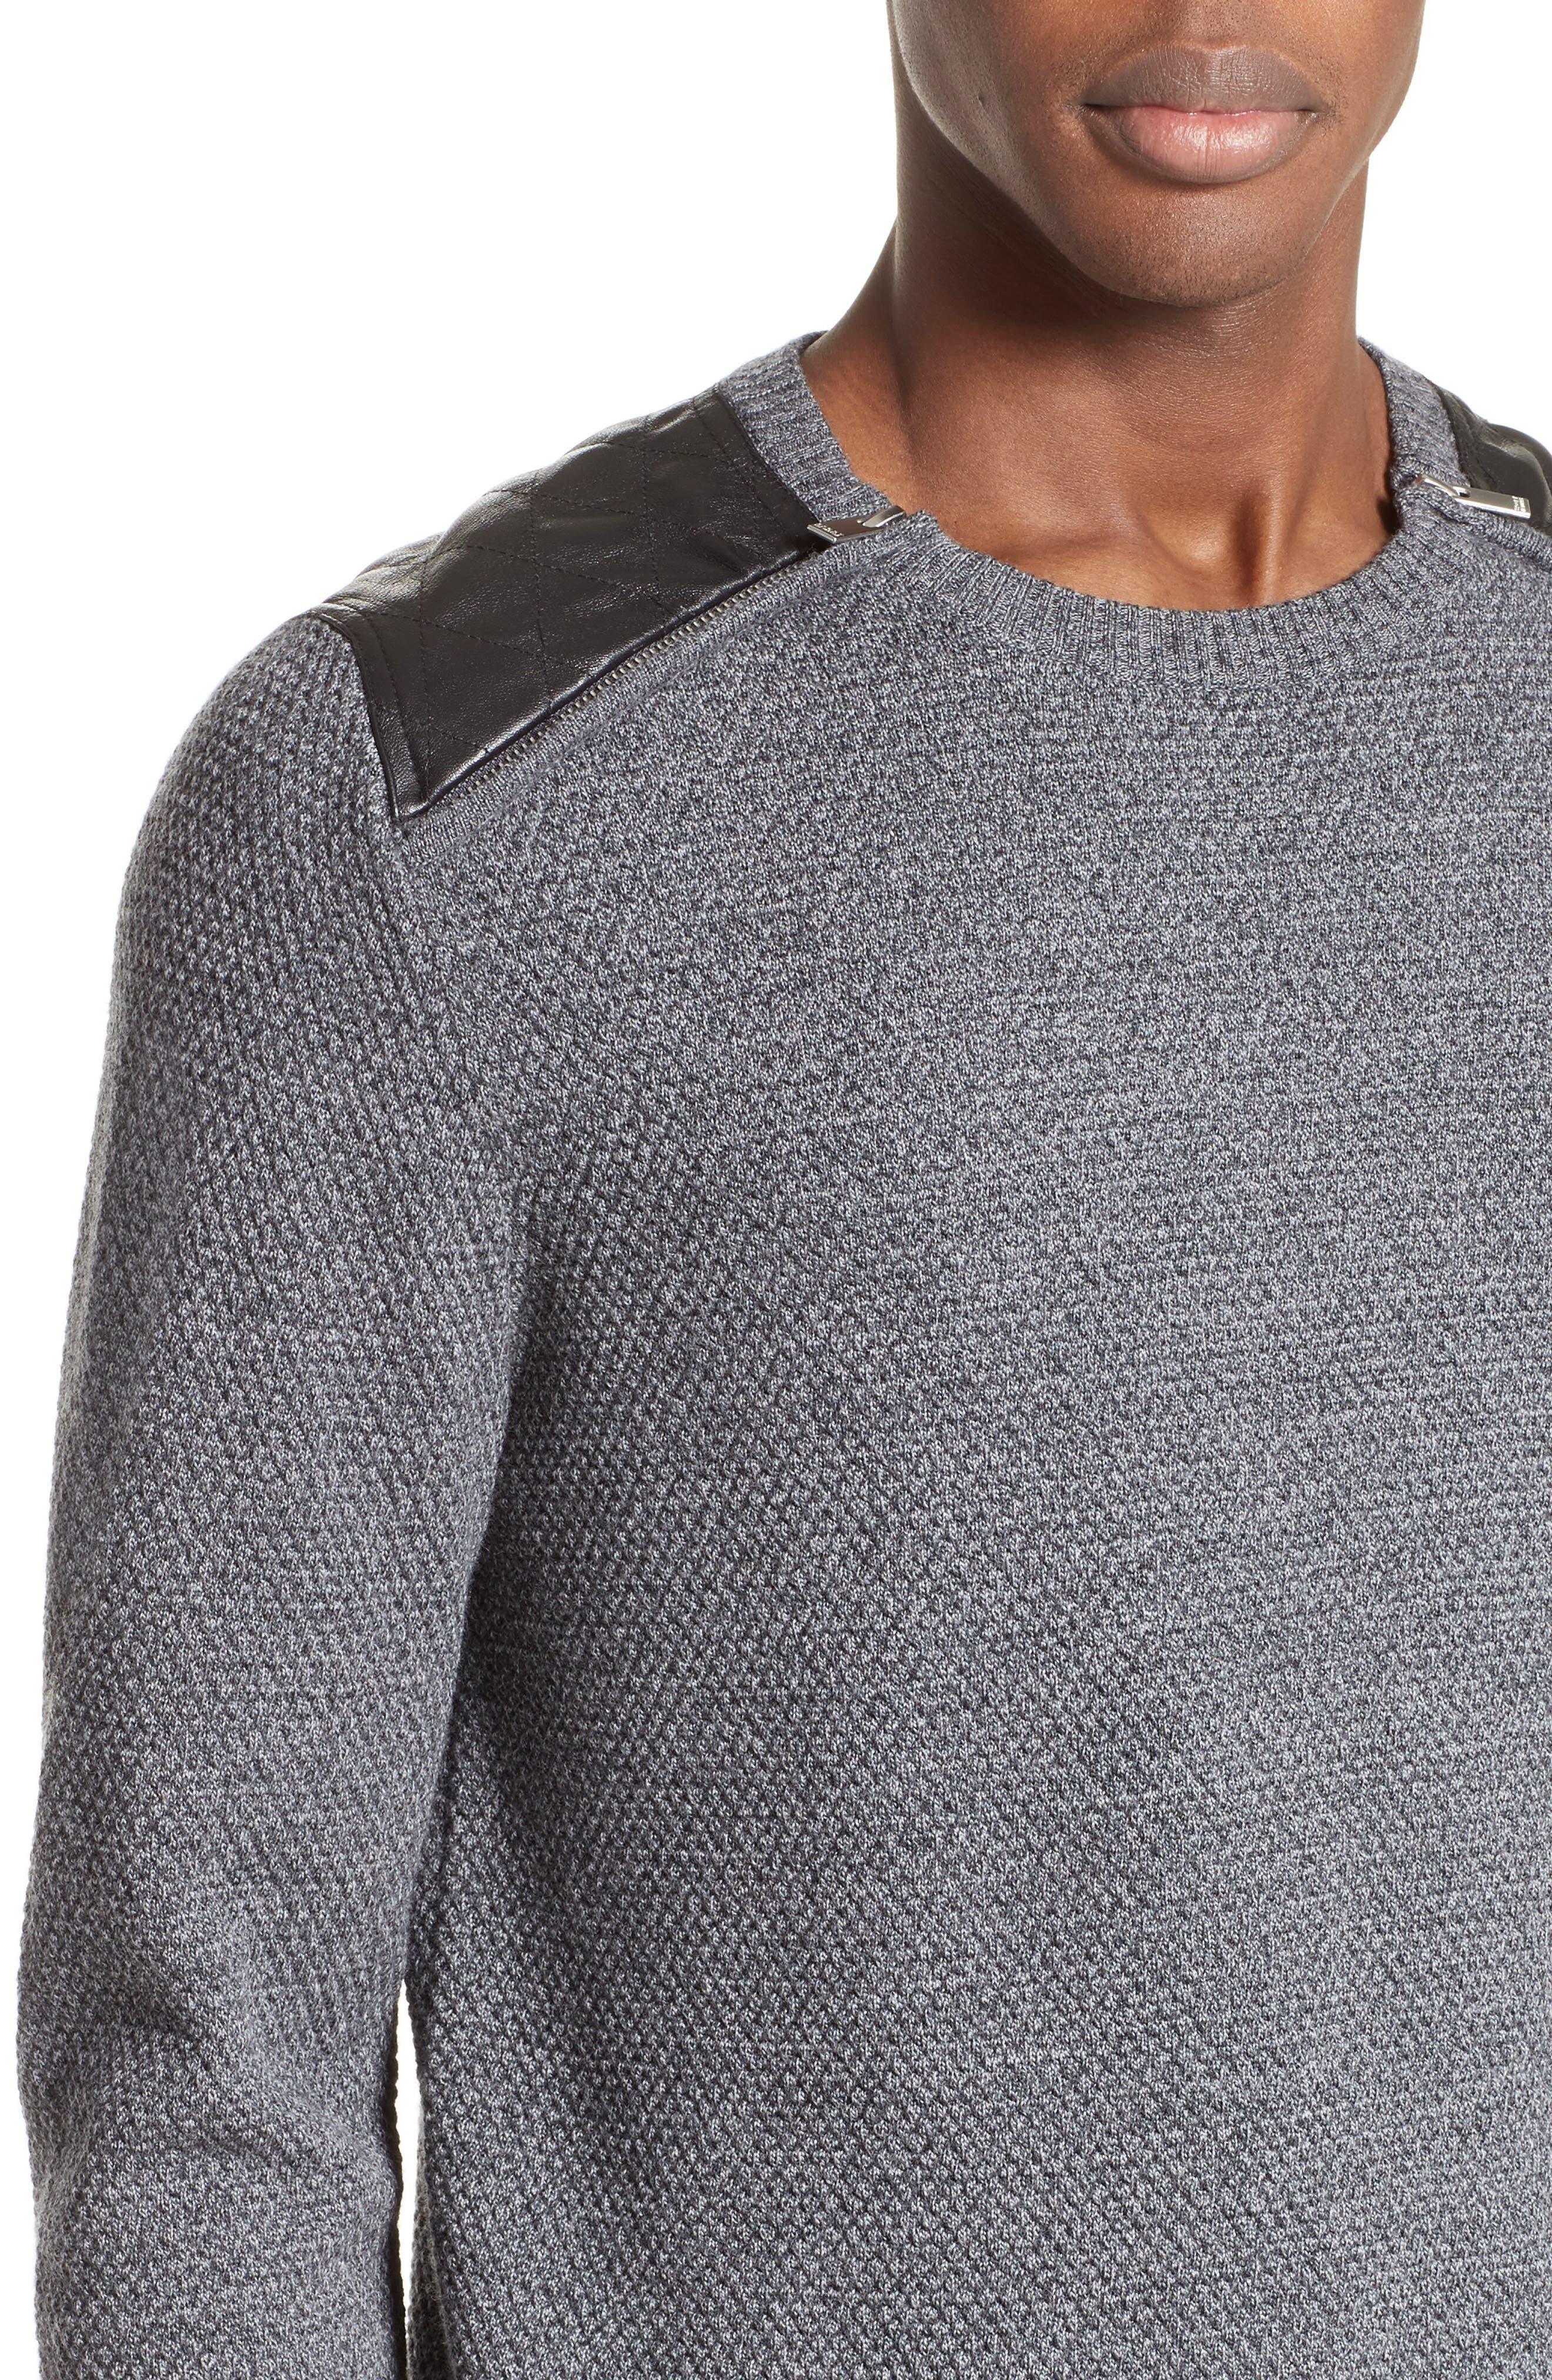 Merino Wool Sweater,                             Alternate thumbnail 4, color,                             020